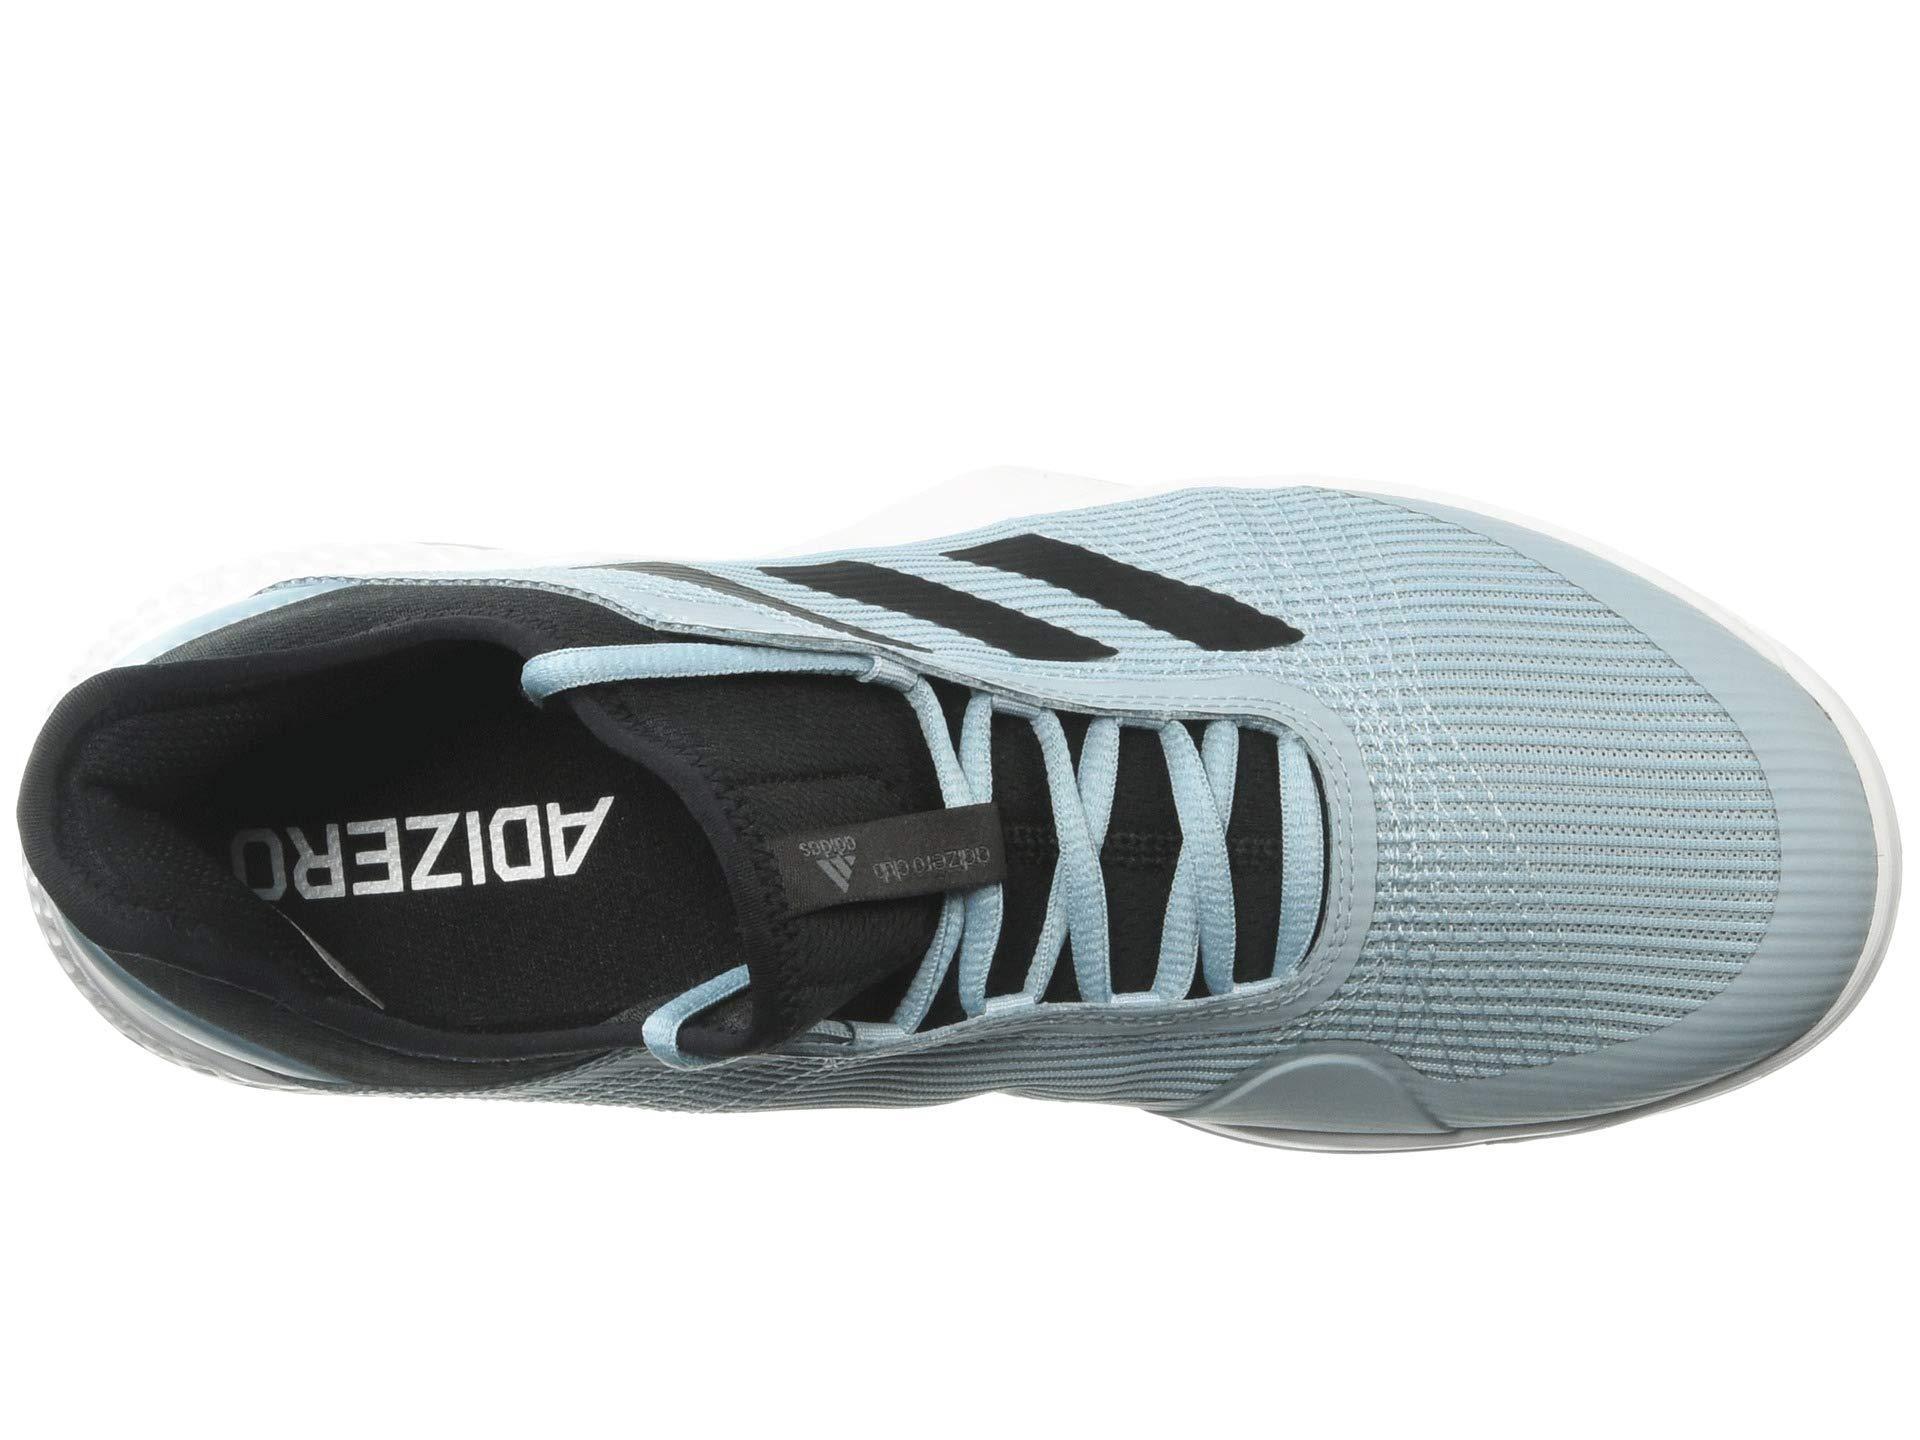 a8d79bf517d17 Lyst - adidas Adizero Club 2 (light Granite shock Red footwear White ...